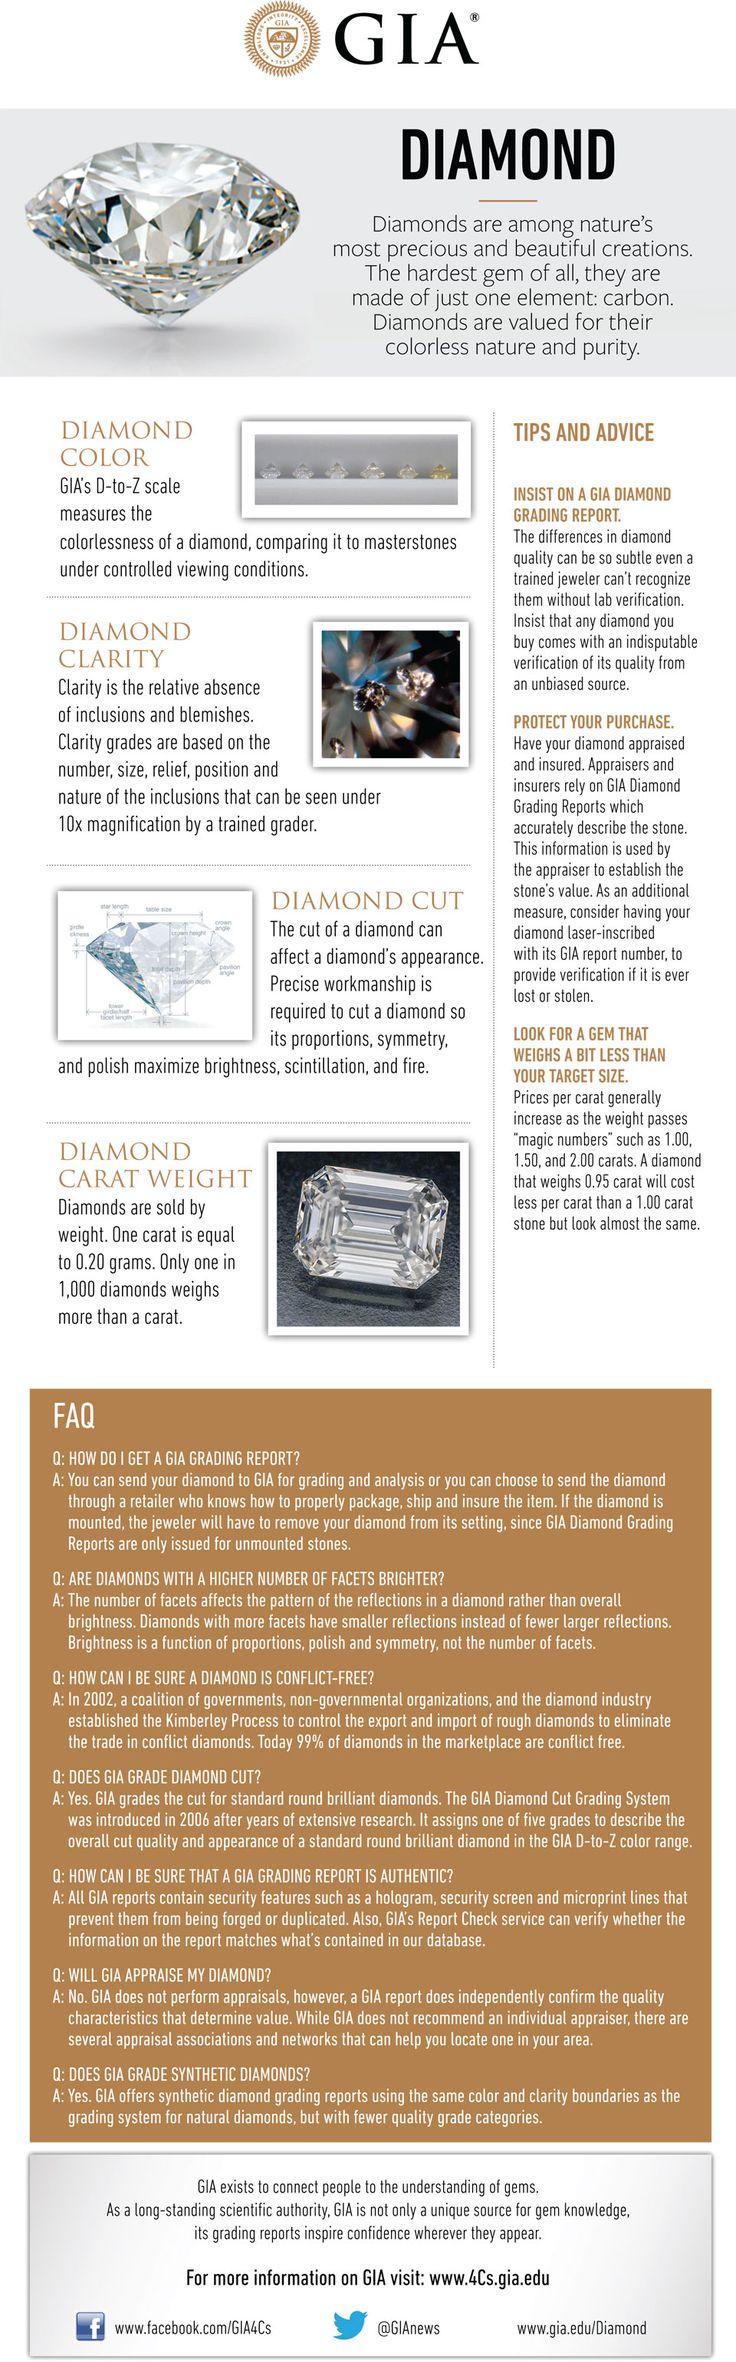 Guía para comprar #diamantes de la GIA